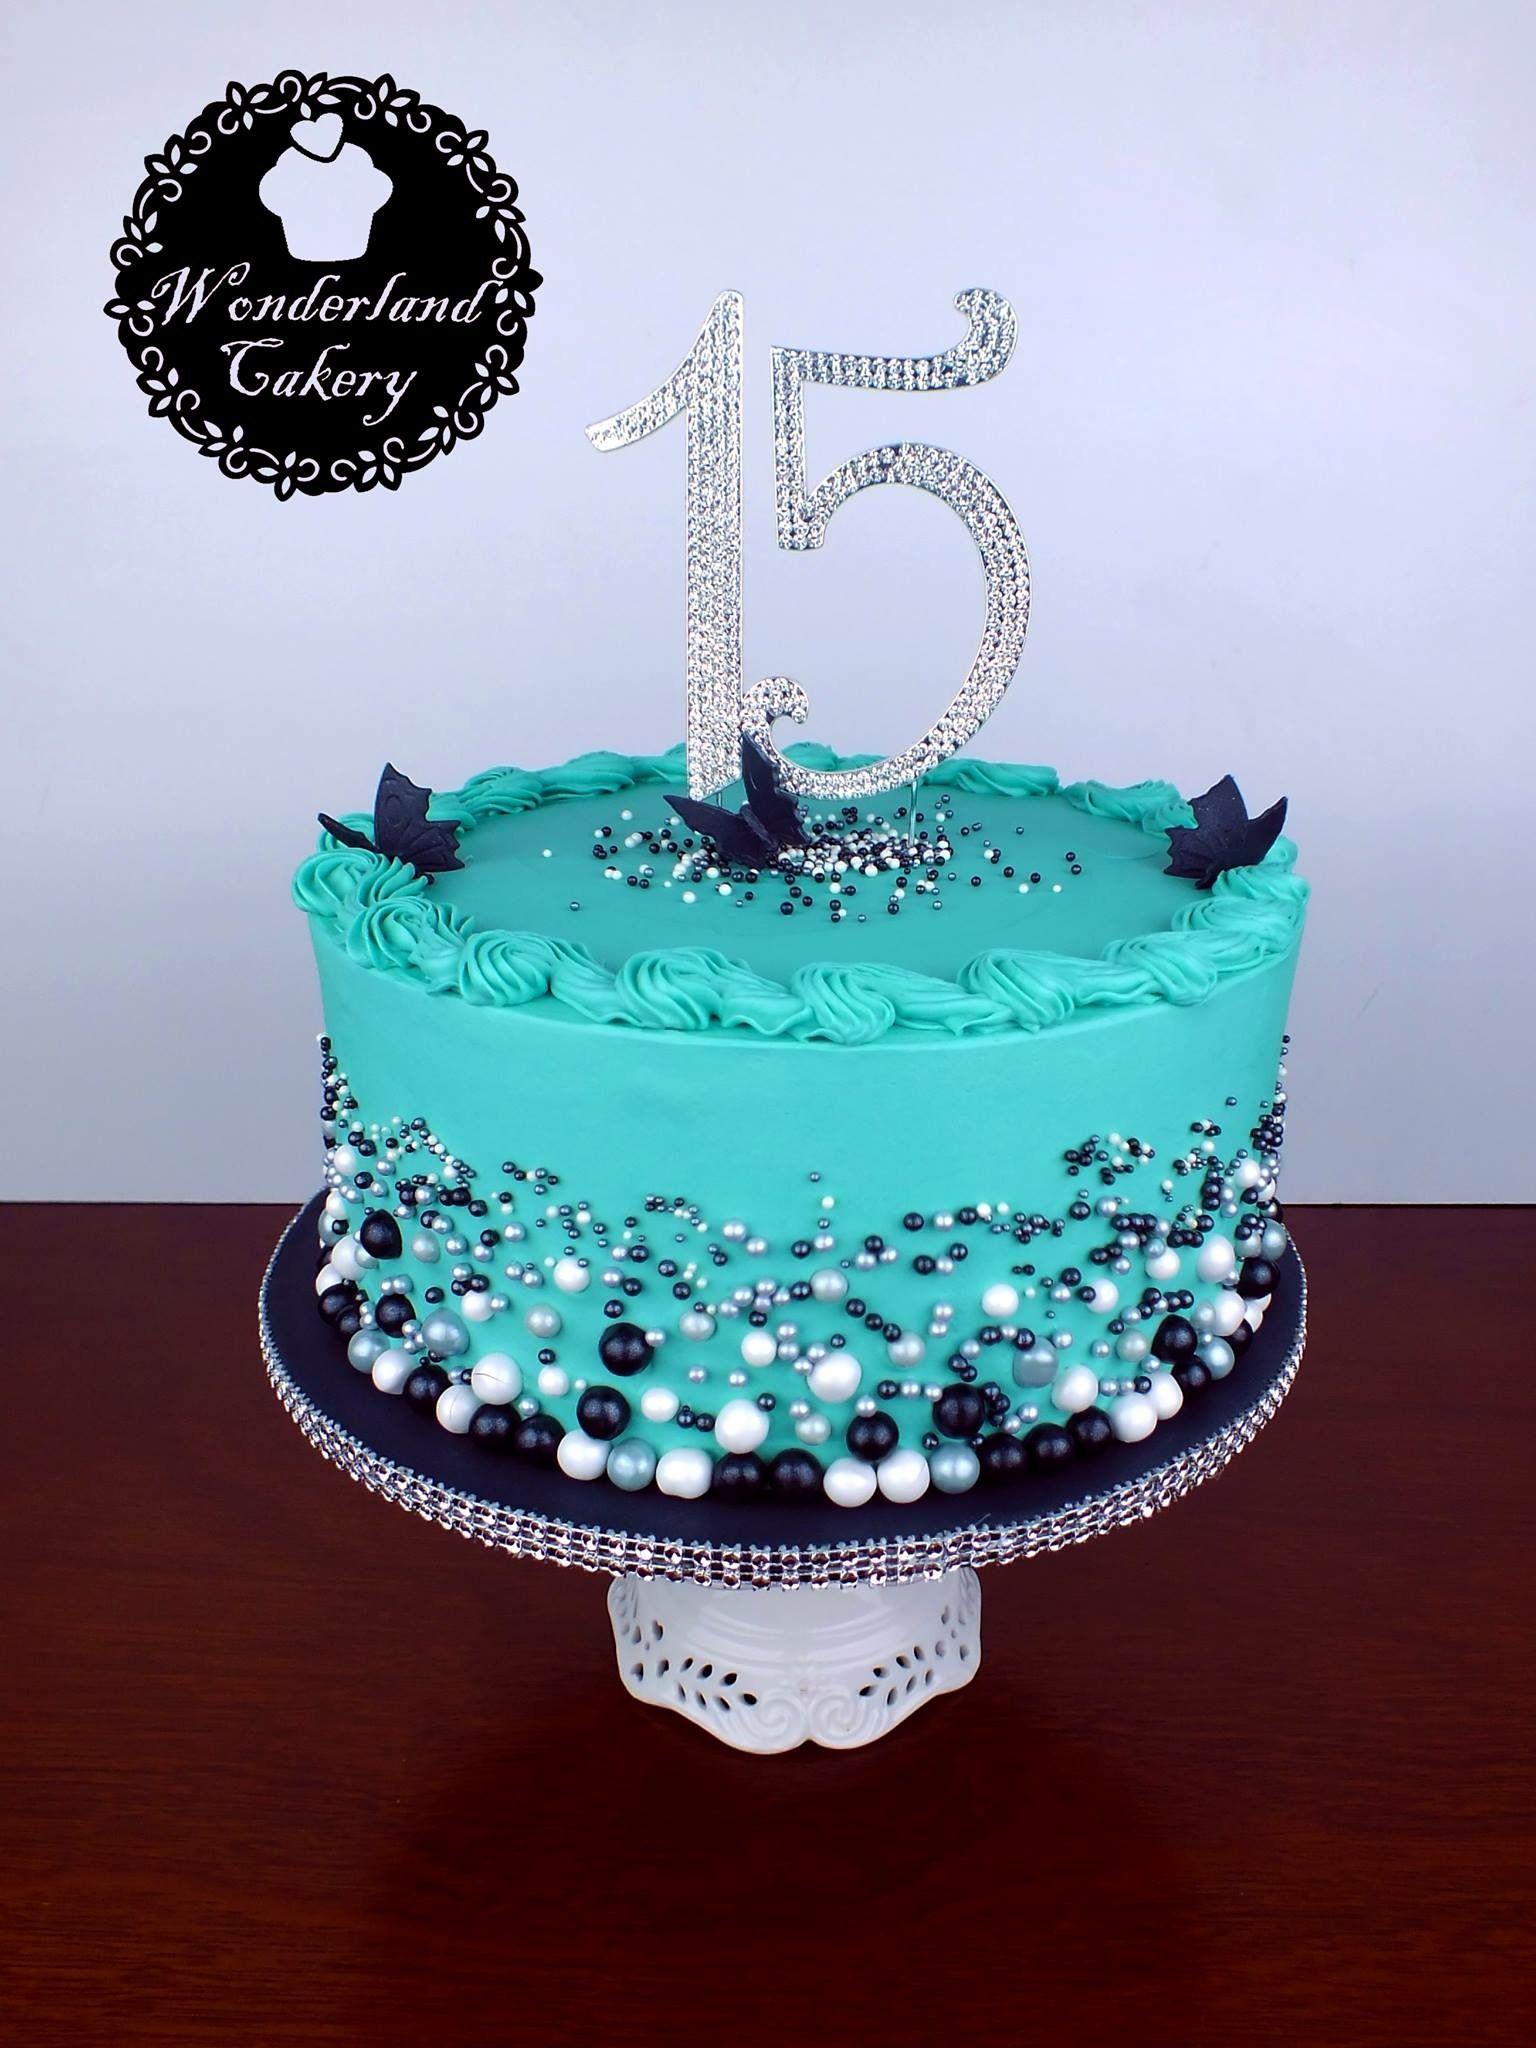 15 Creative & Unique Birthday Cake Ideas for Girls | Yummycake